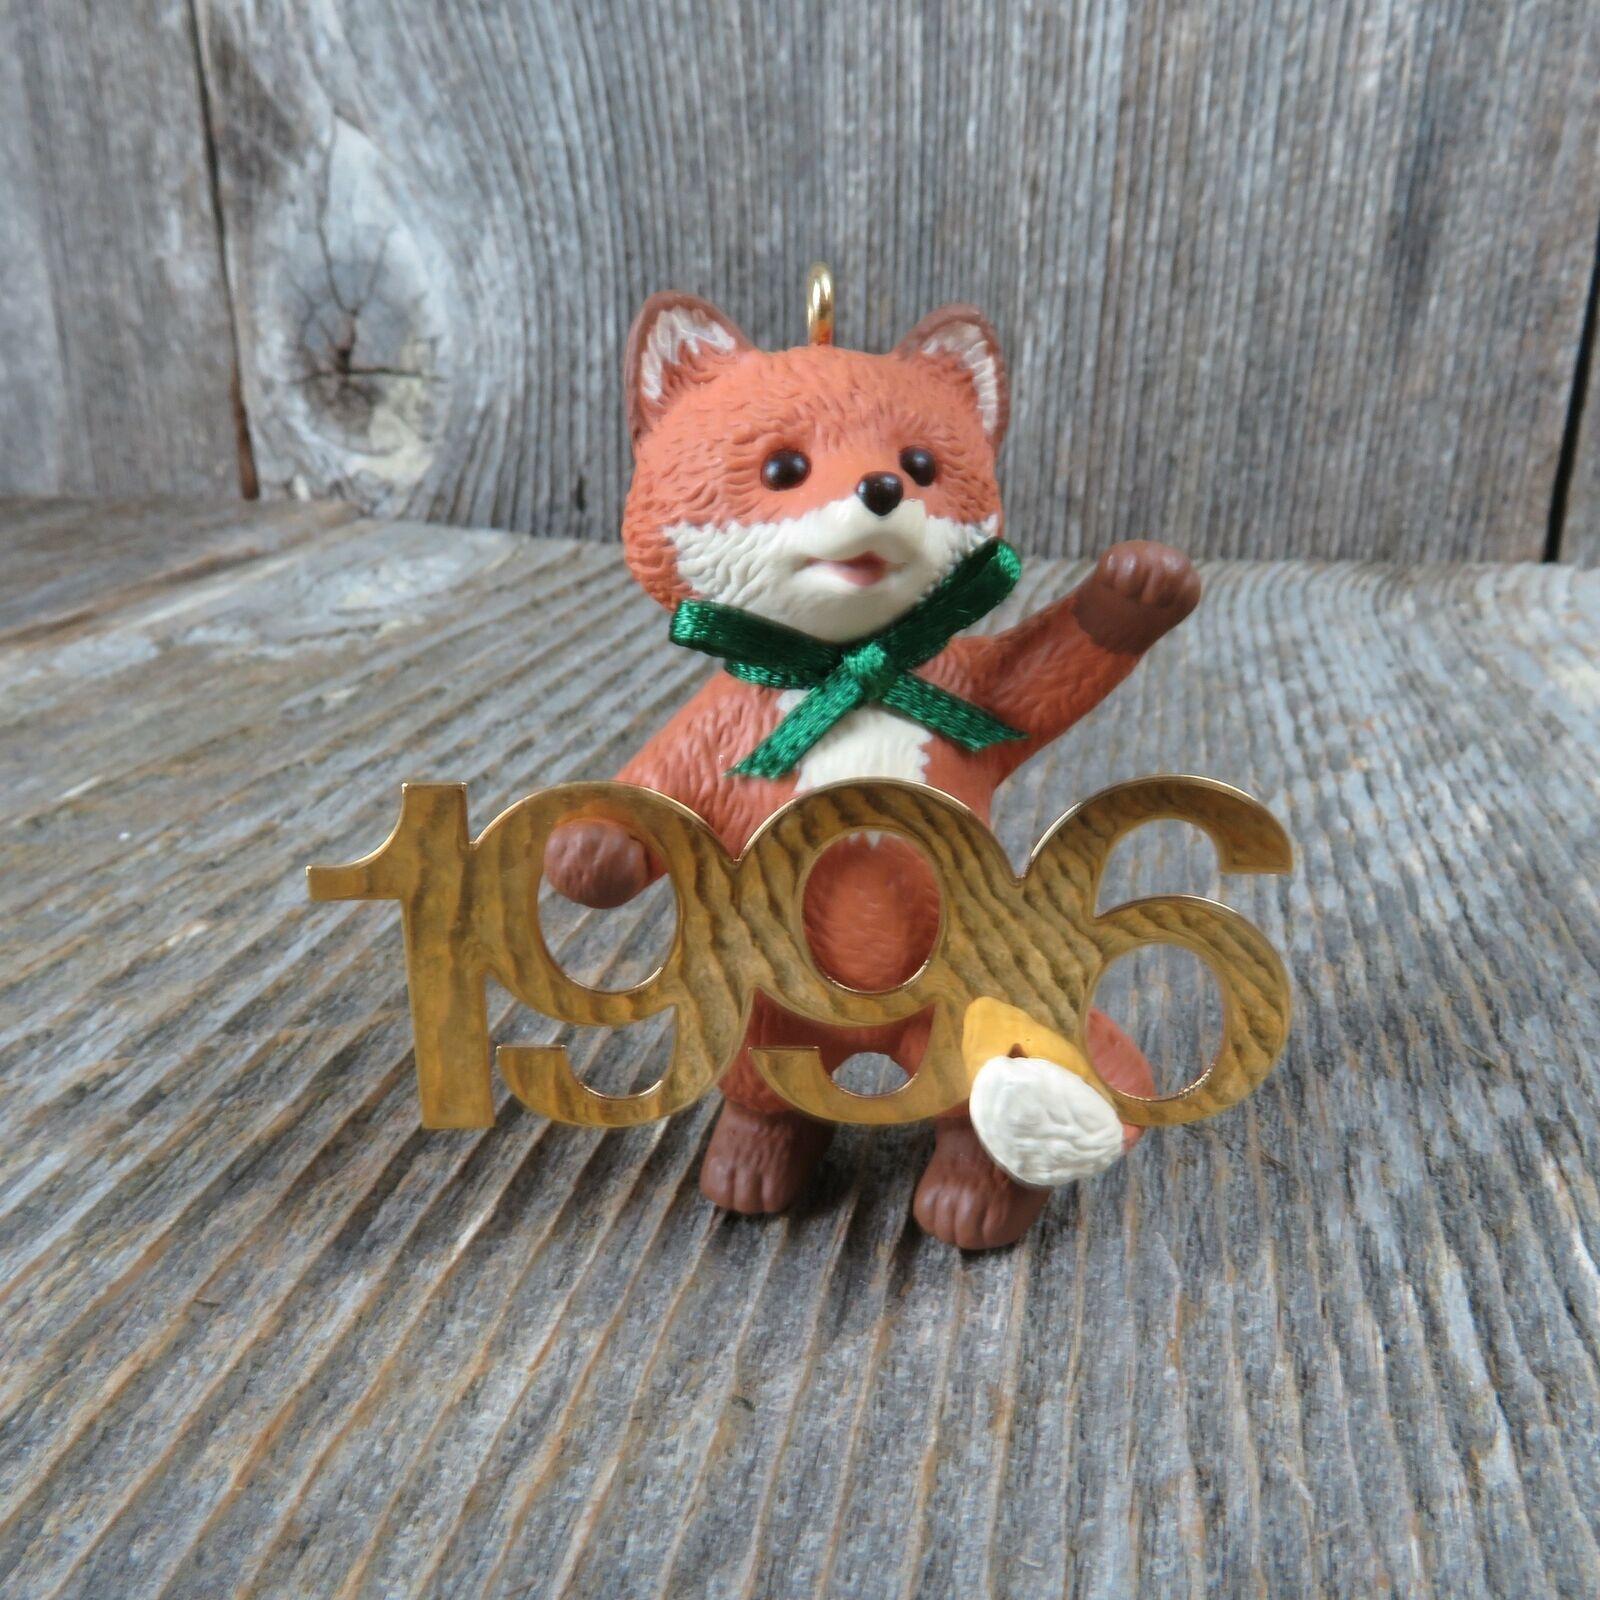 Vintage Red Fox Hallmark Keepsake Christmas Ornament 1996 Fabulous Decade